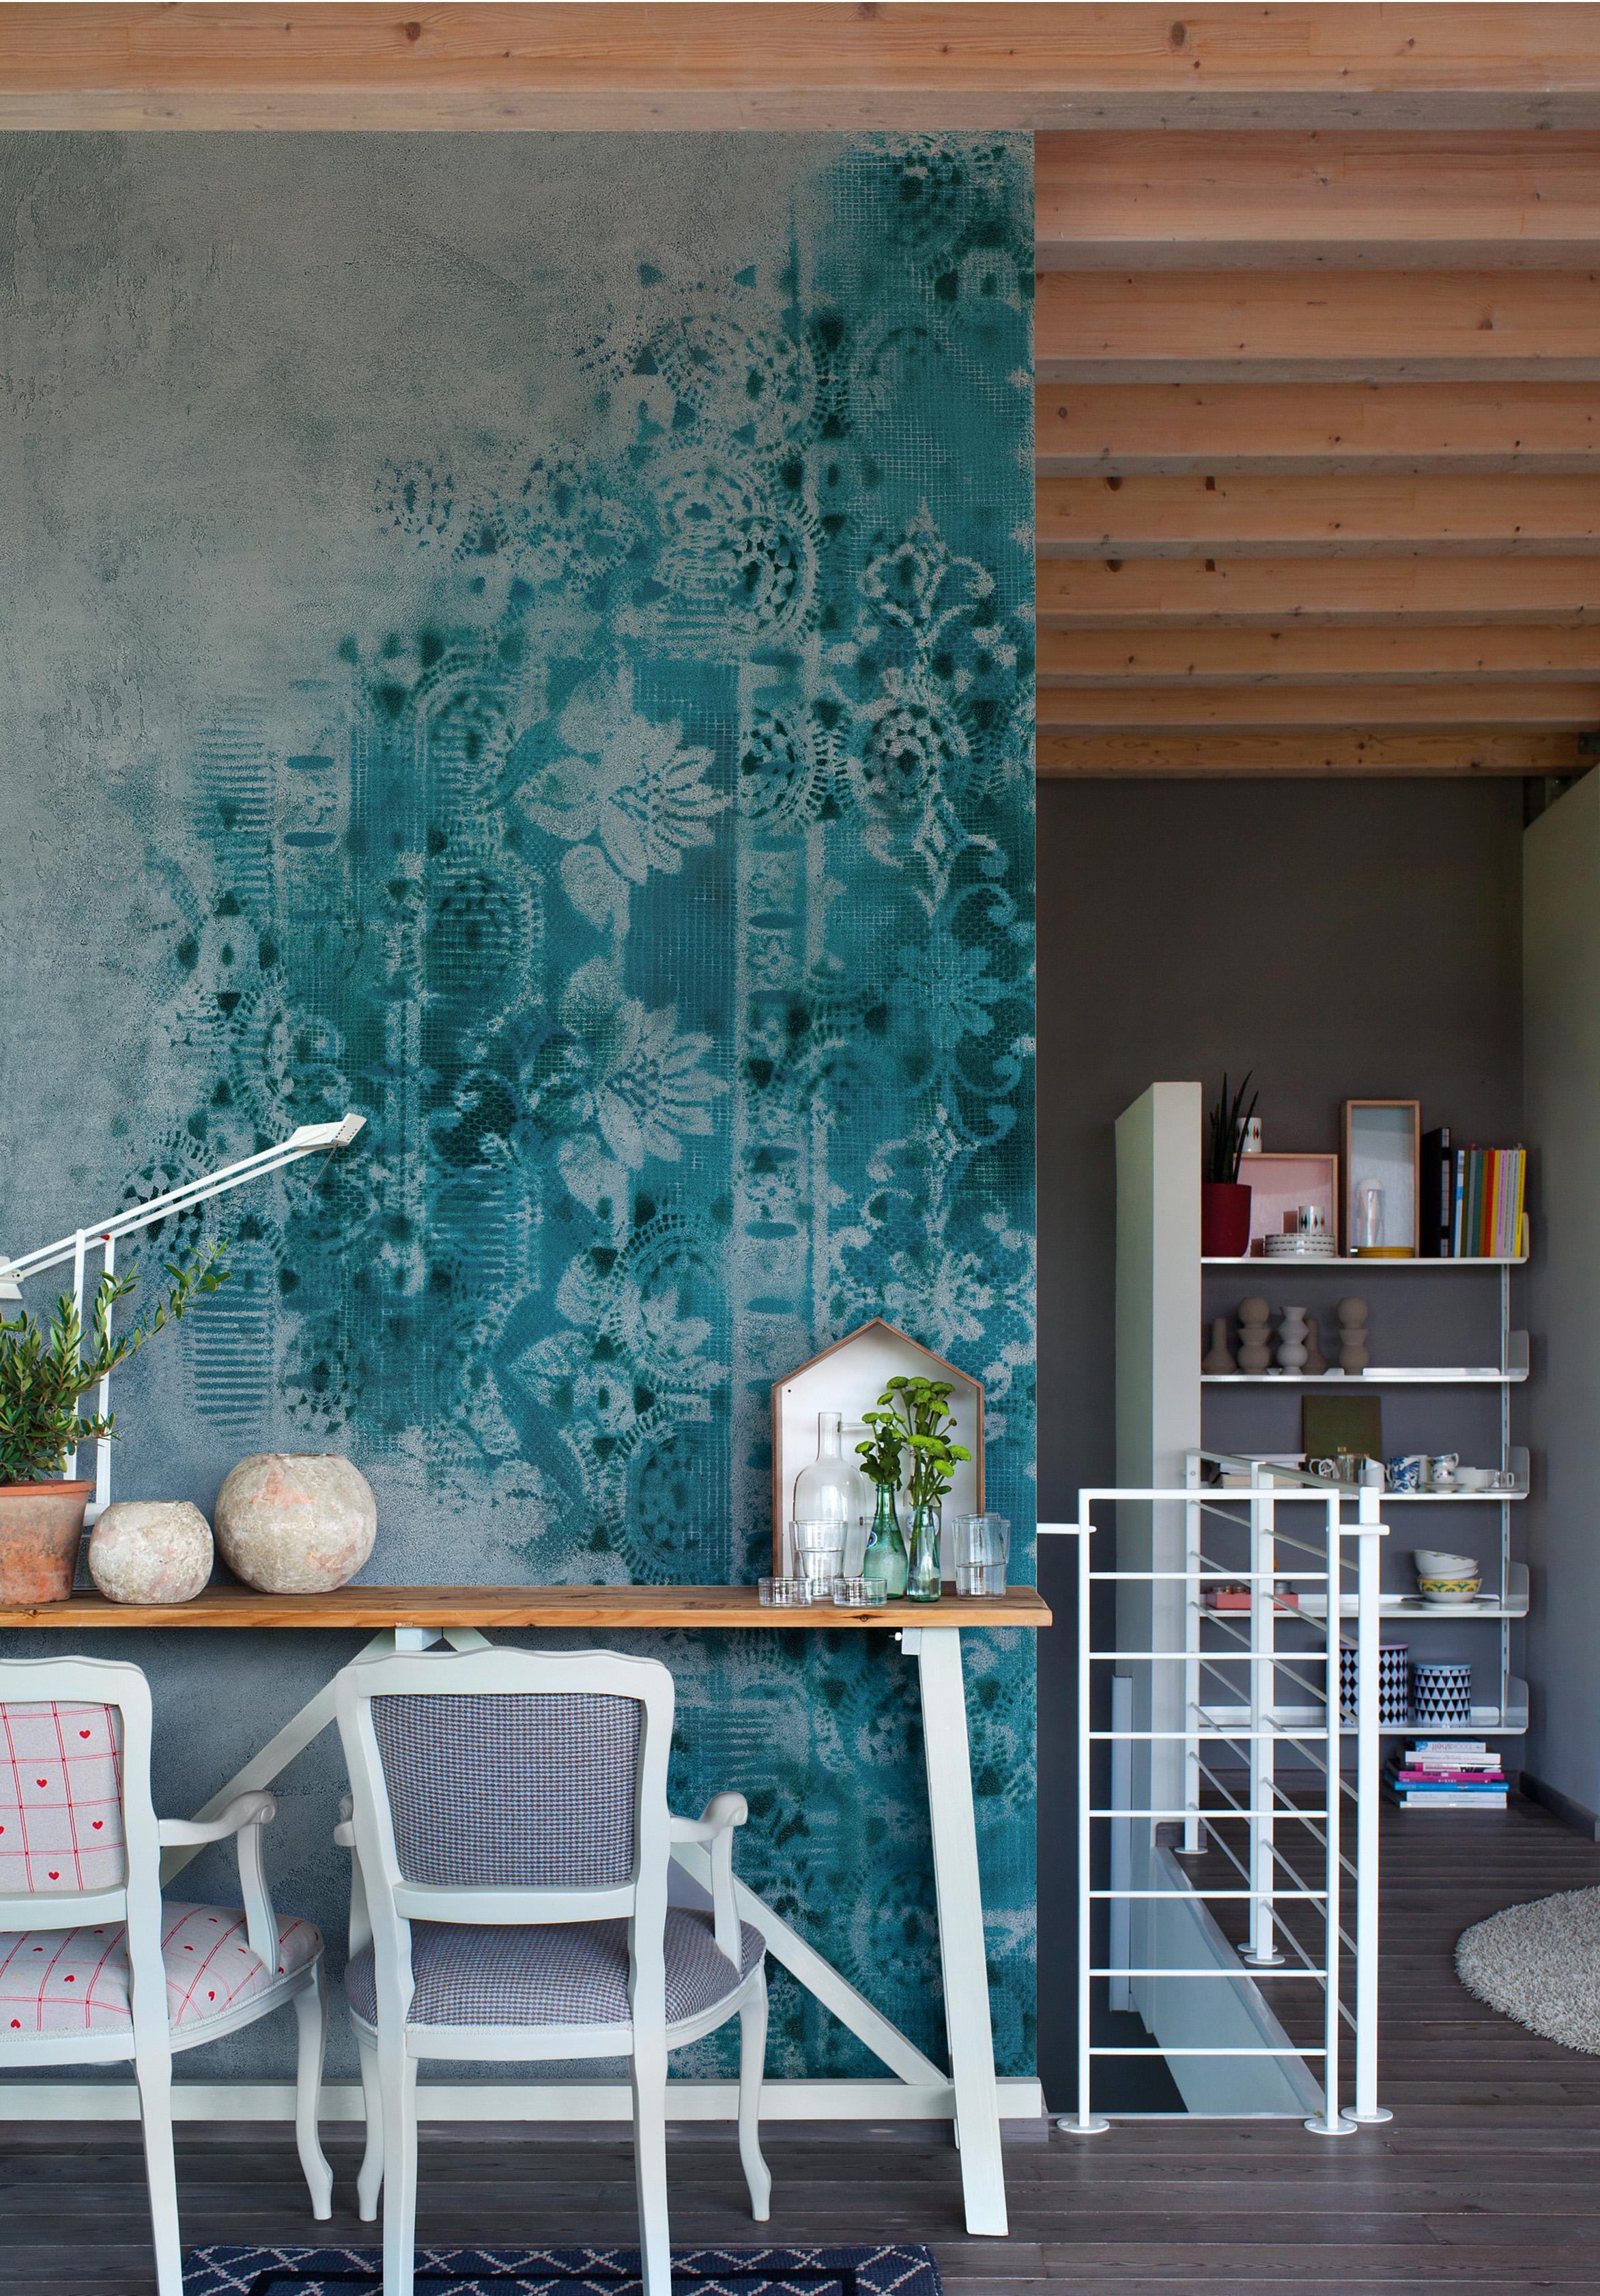 Kreative Wandgestaltung #stuhl #wandverkleidung #wandgestaltung #shabbychic  #weißerstuhl #wallu0026amp;deco